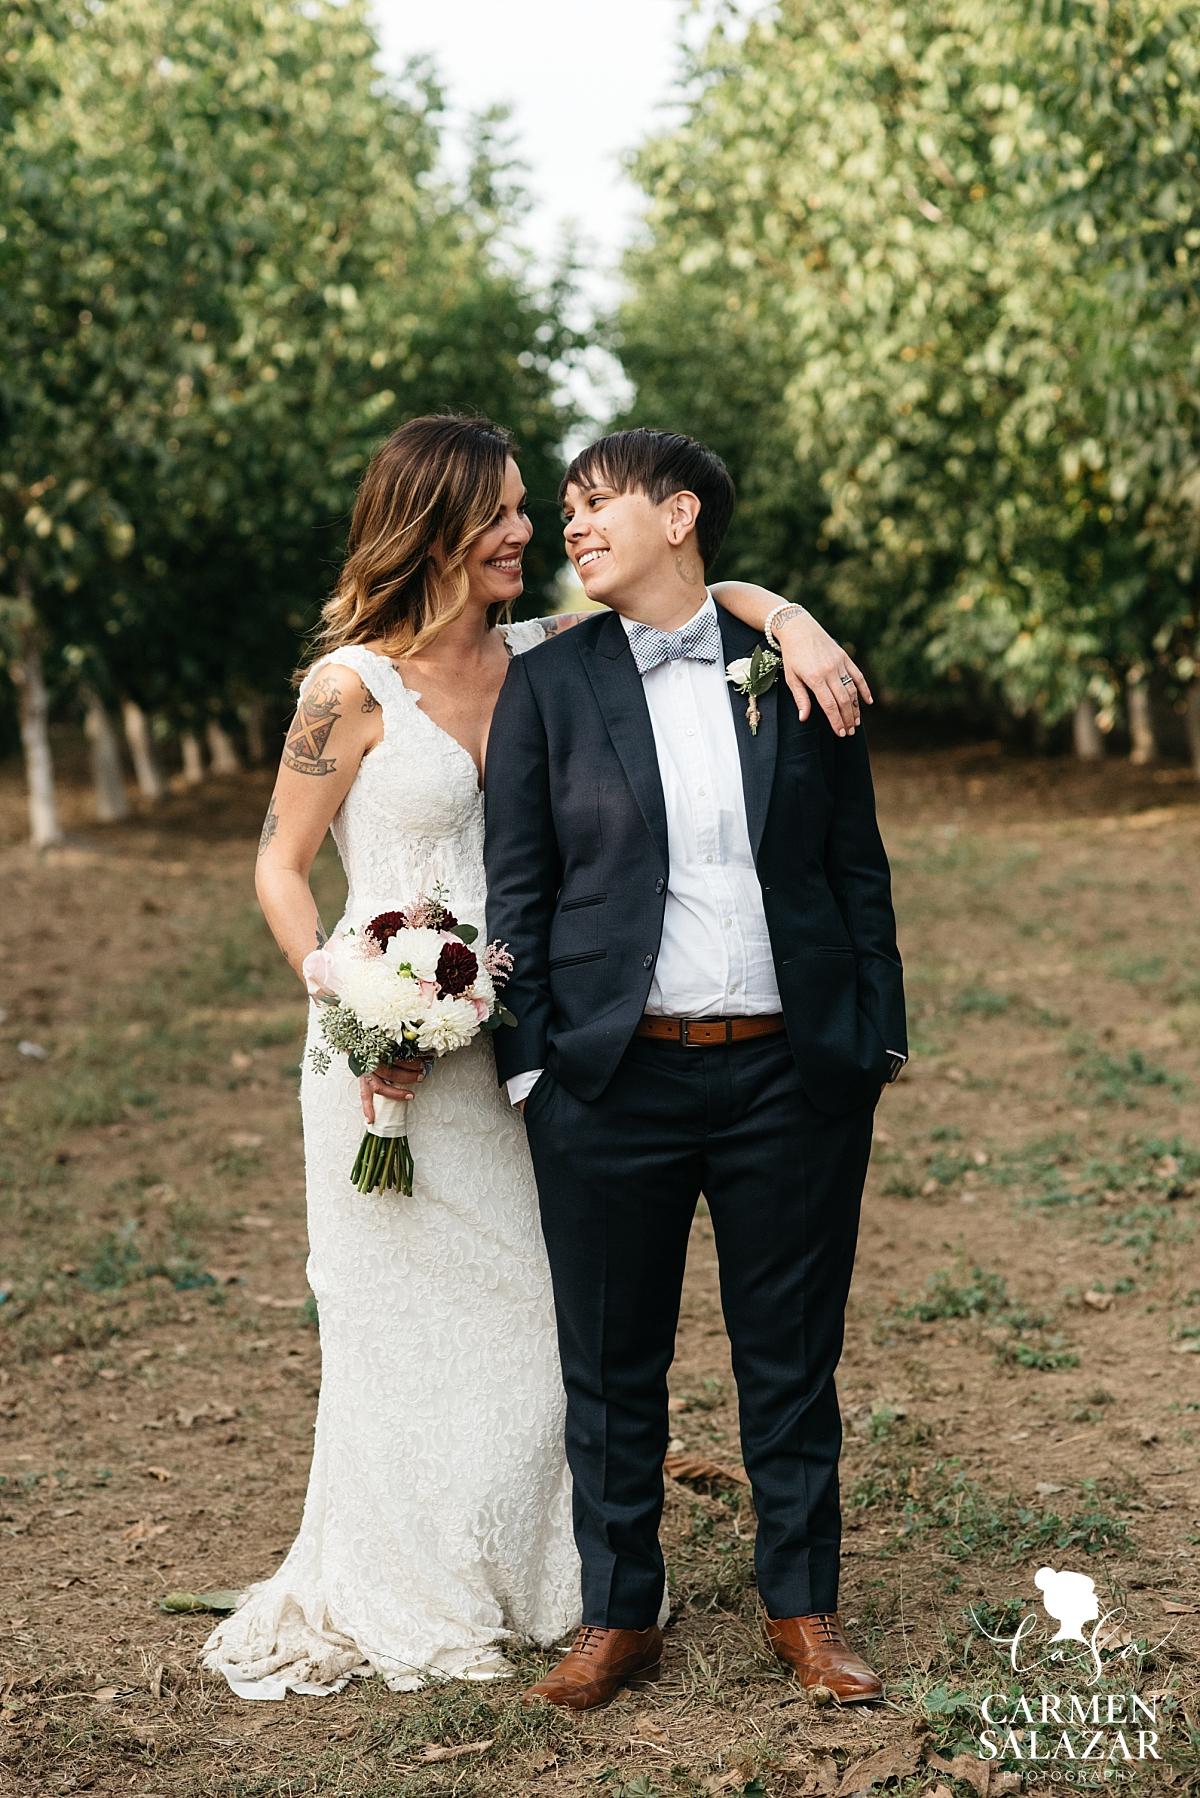 California same sex wedding style inspiration - Carmen Salazar